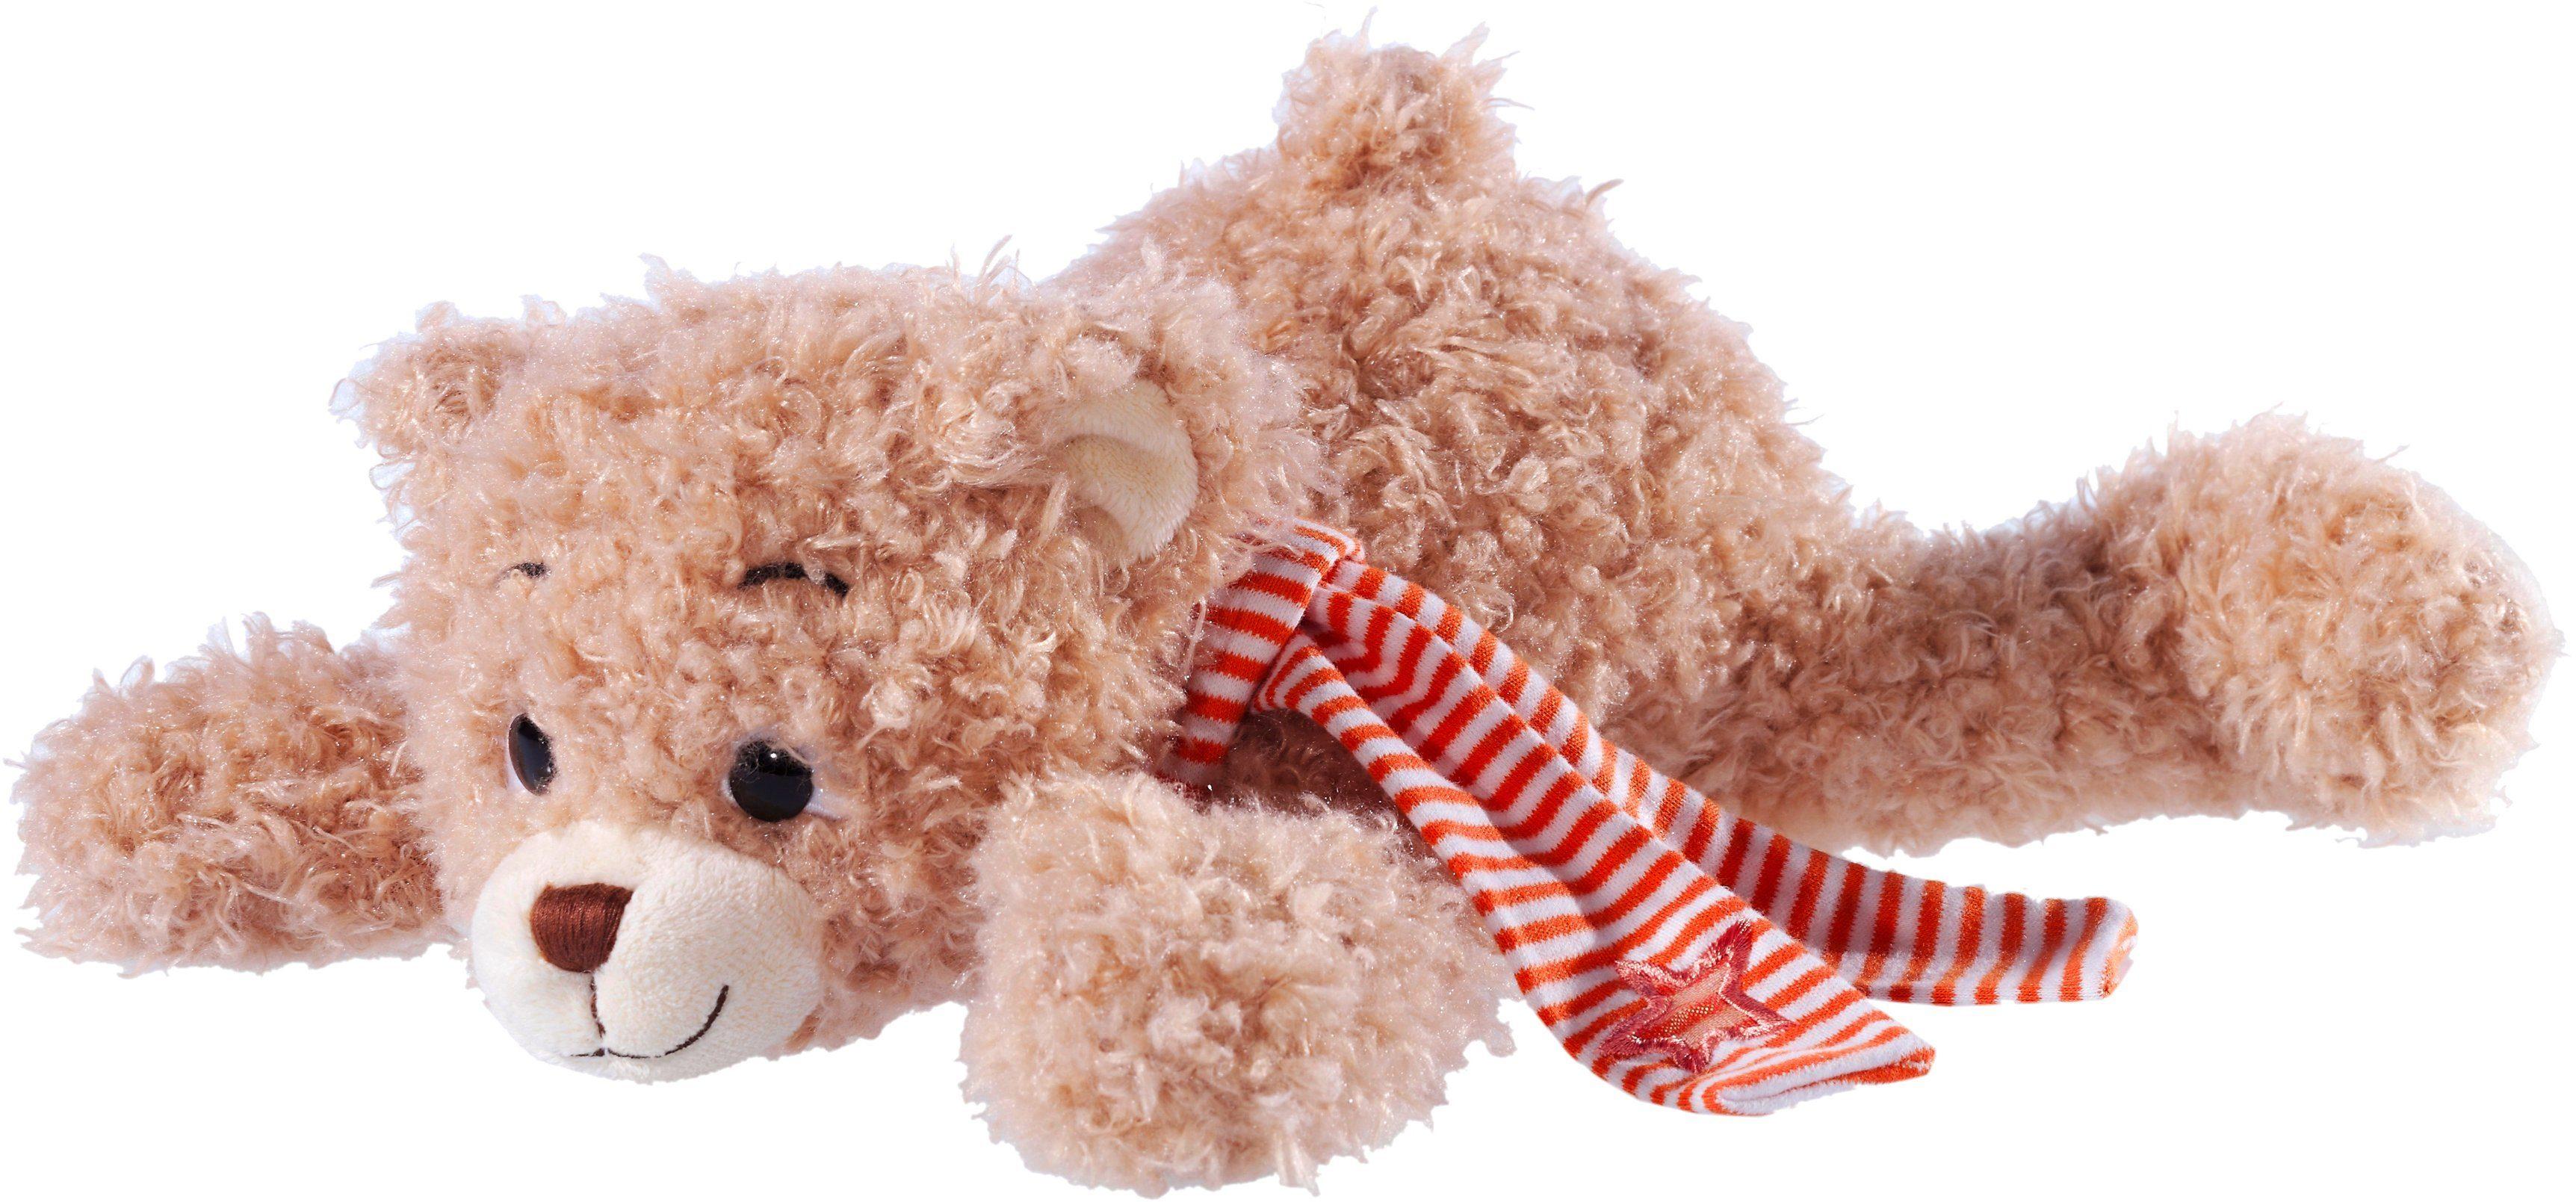 Heunec Kuschelbär, »Friendsheep Teddy Starlight liegend 35 cm«